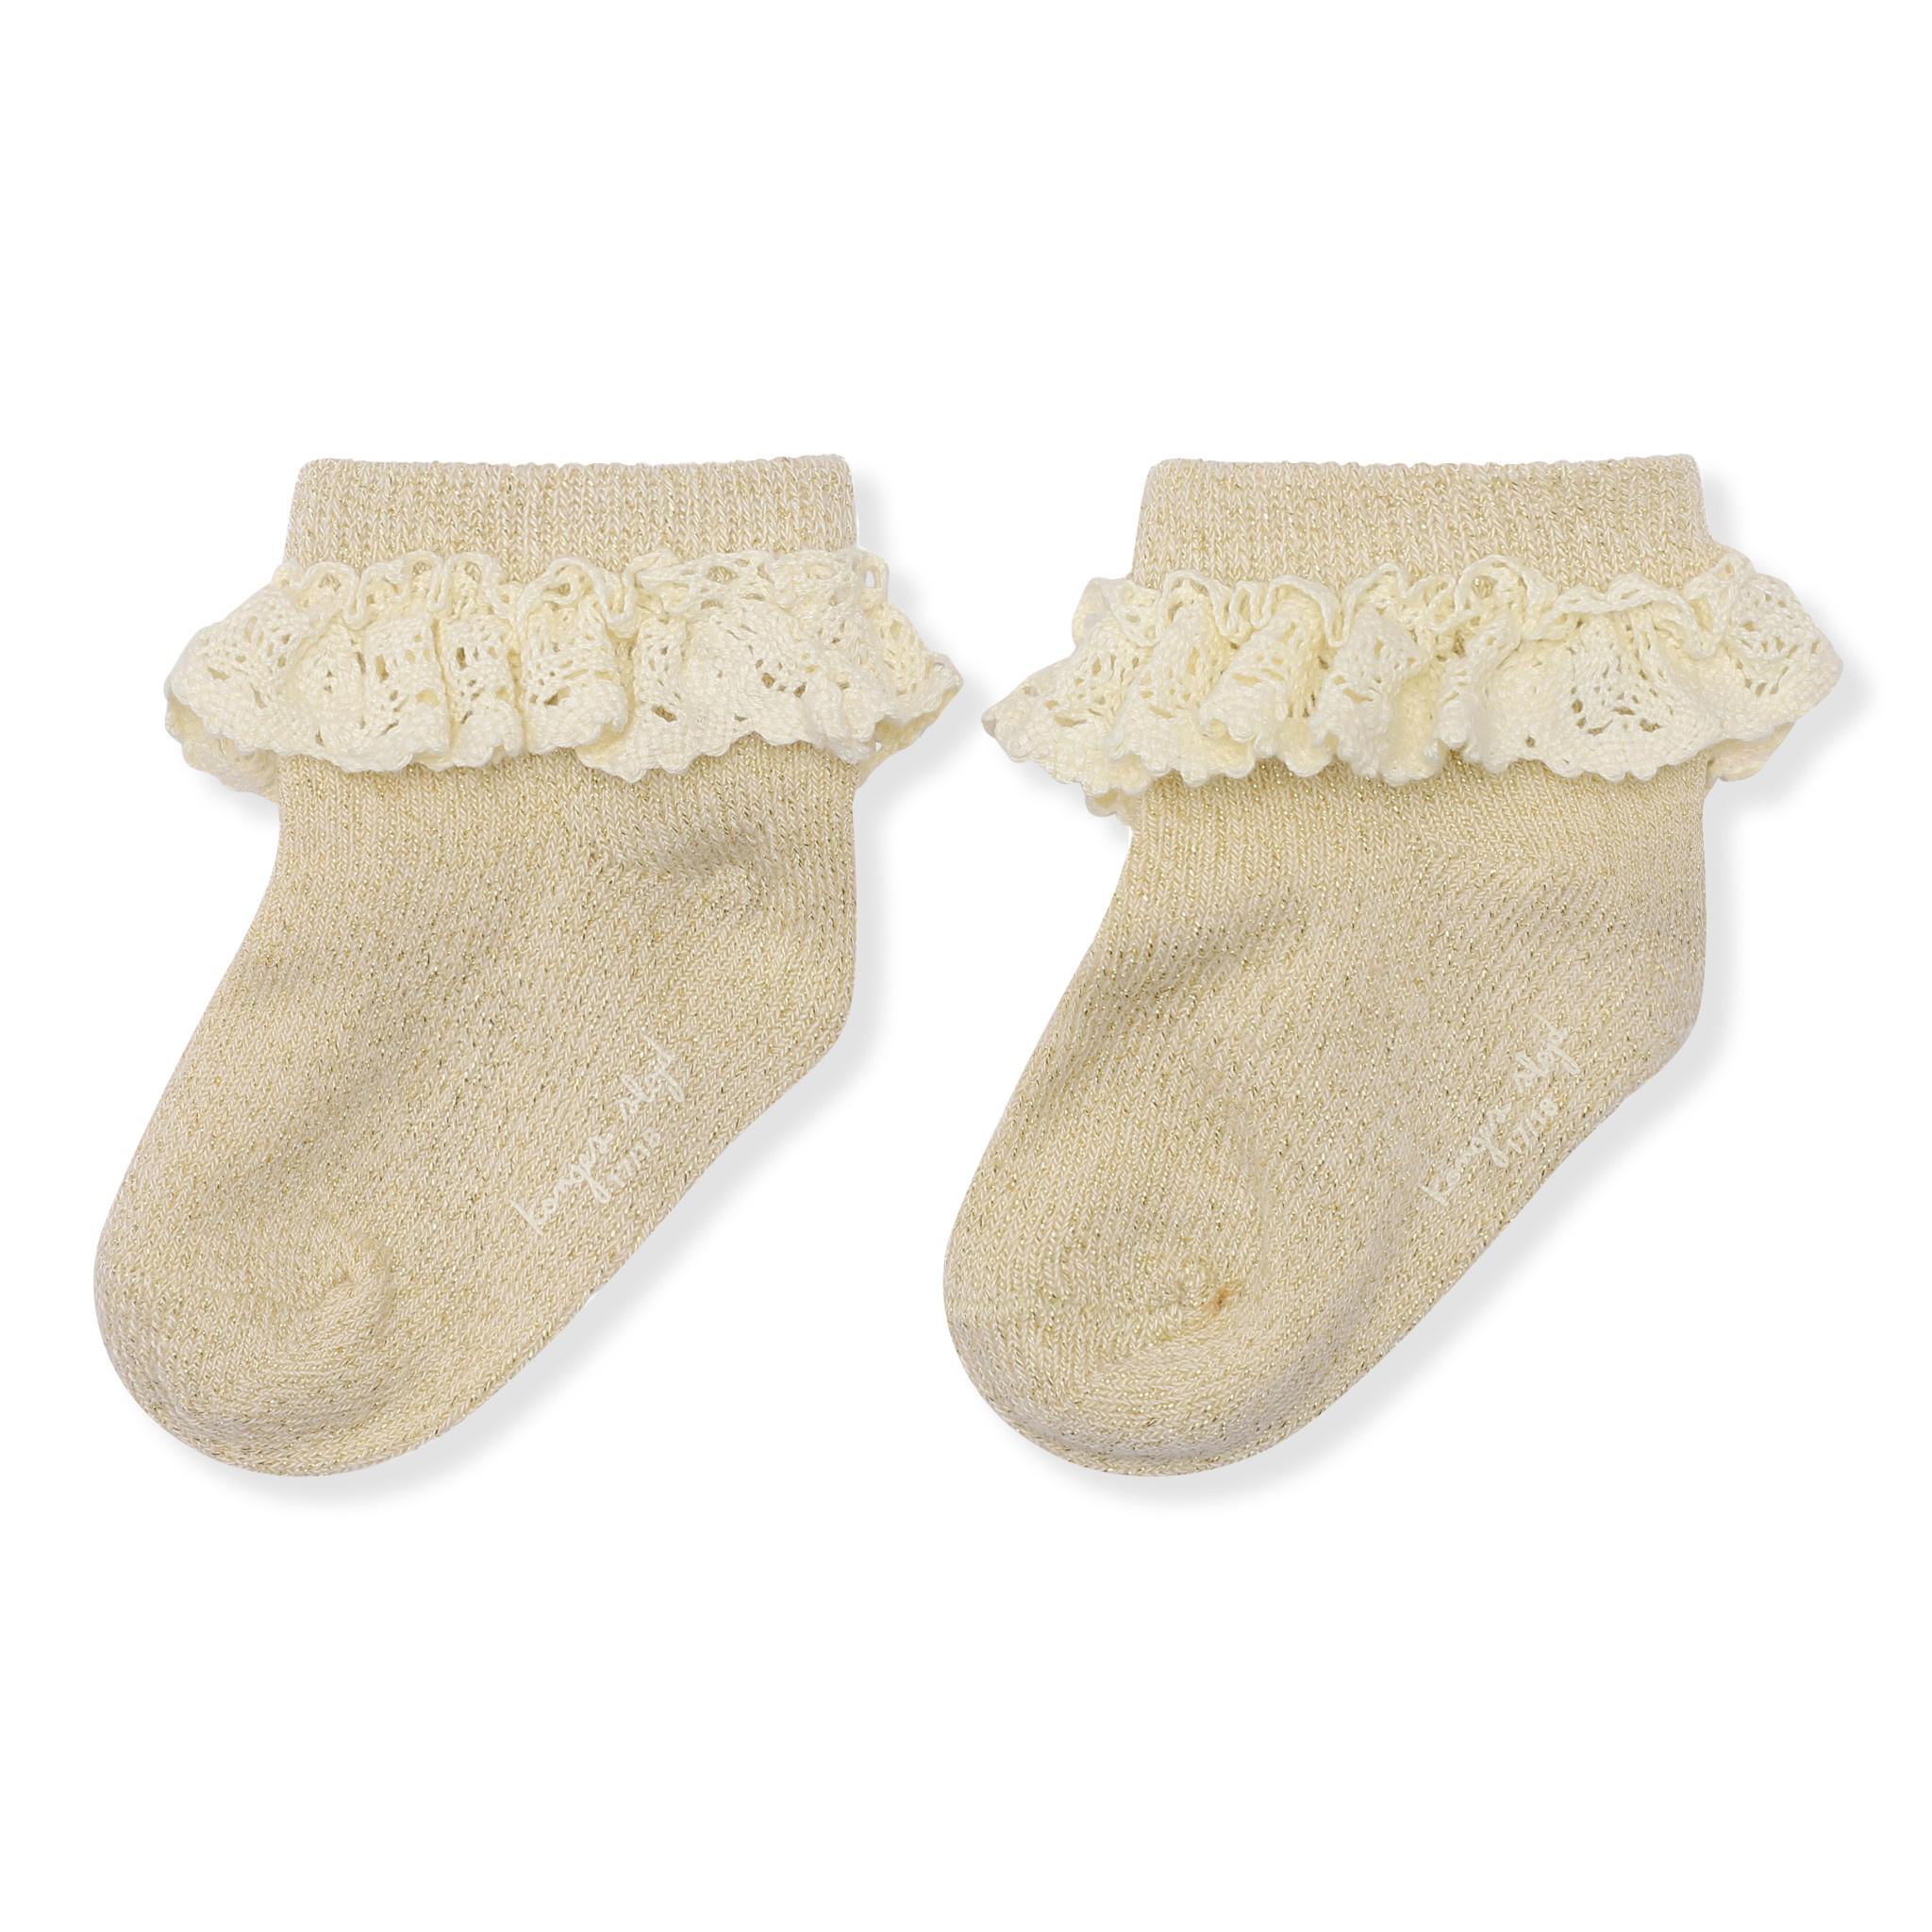 Lace lurex socks creme-1